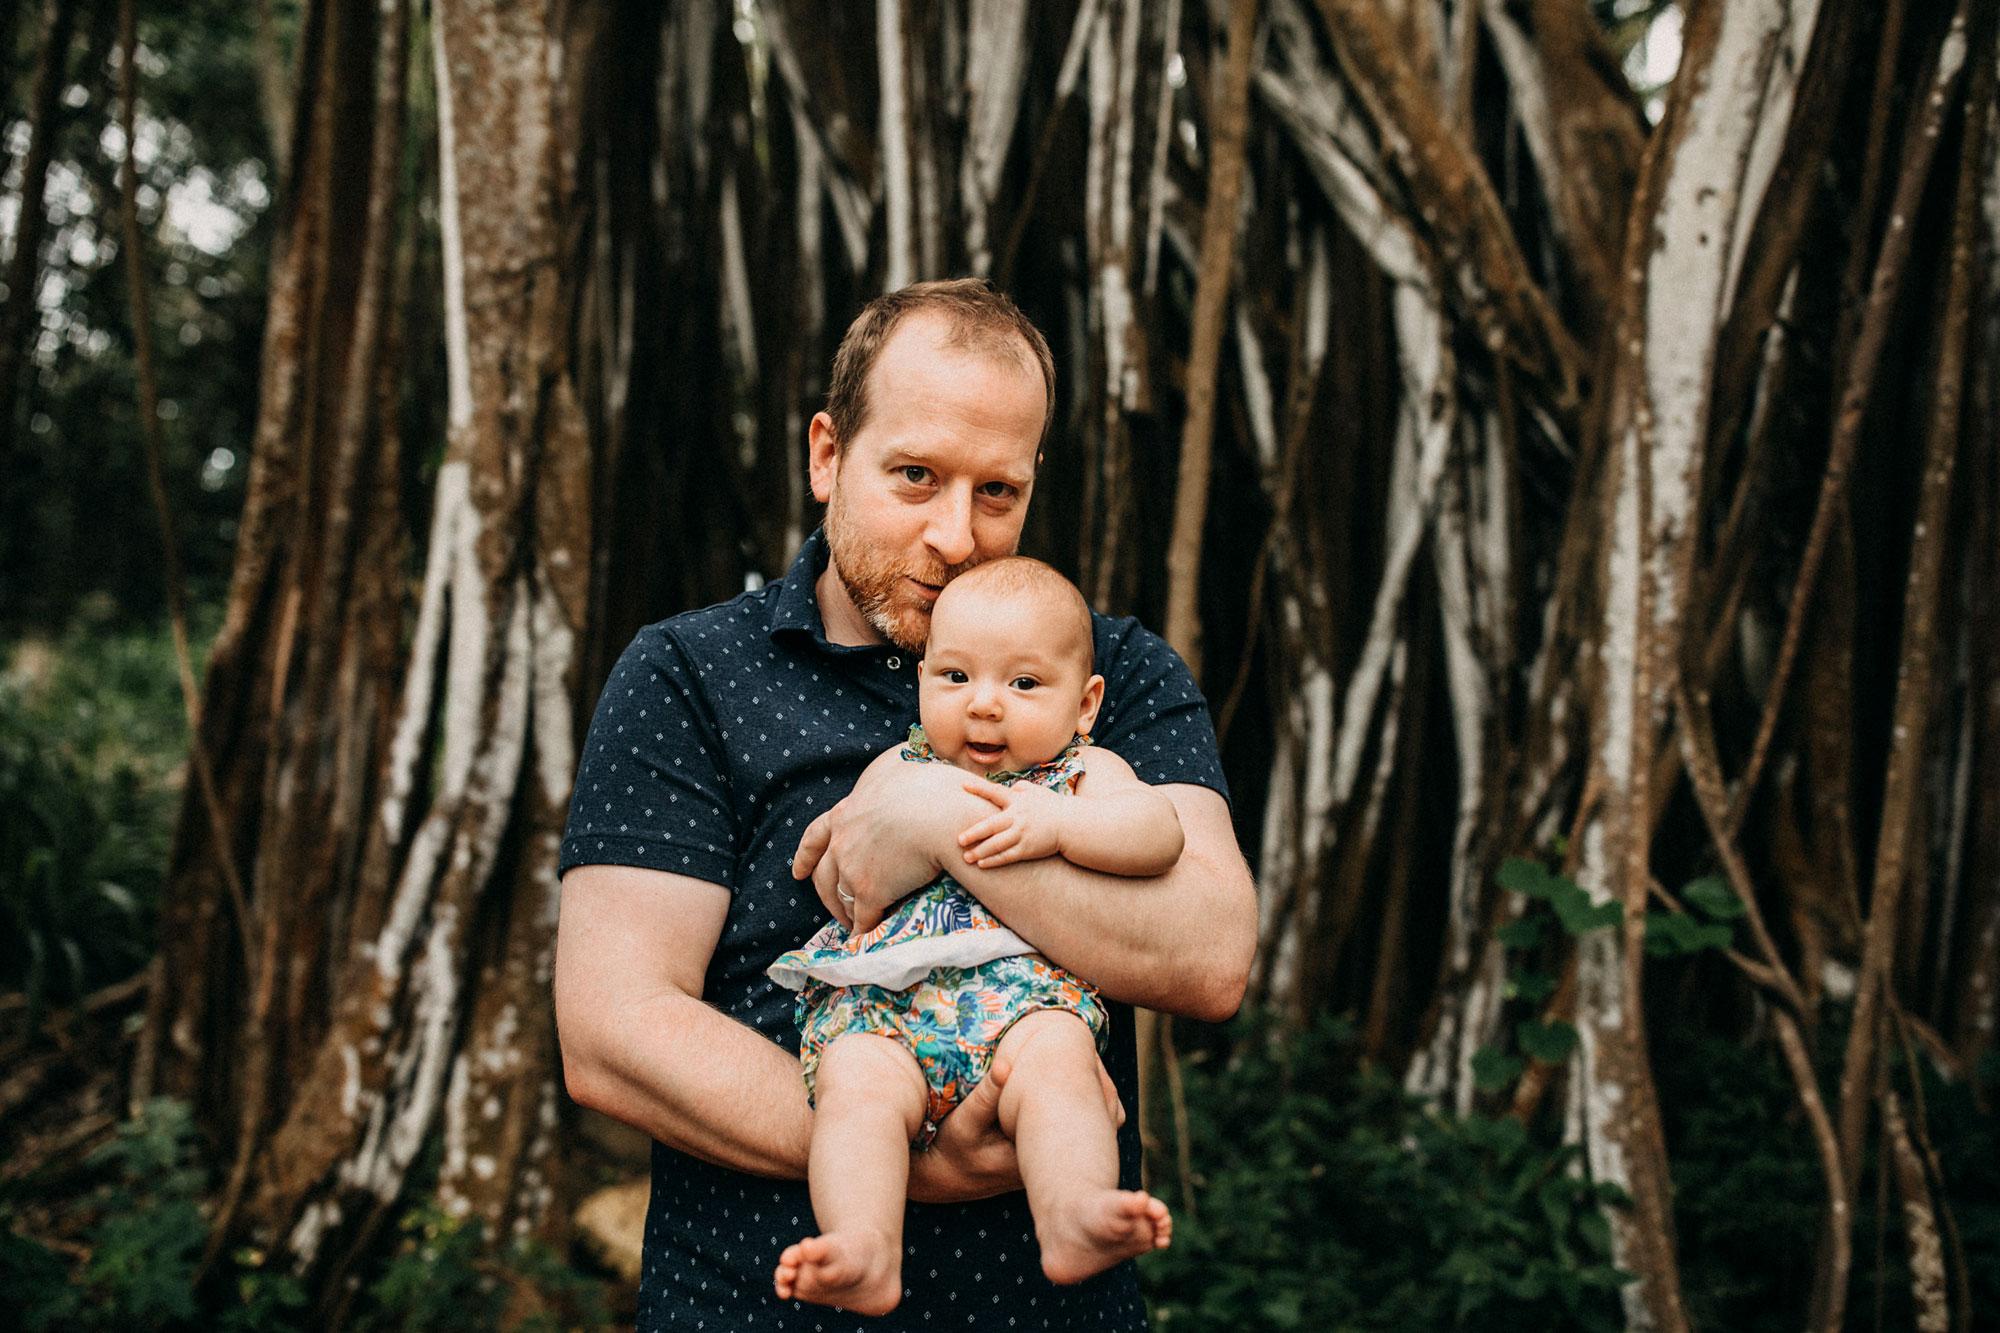 Family-Photographer-North-Shore-Oahu-Hawaii-04.jpg